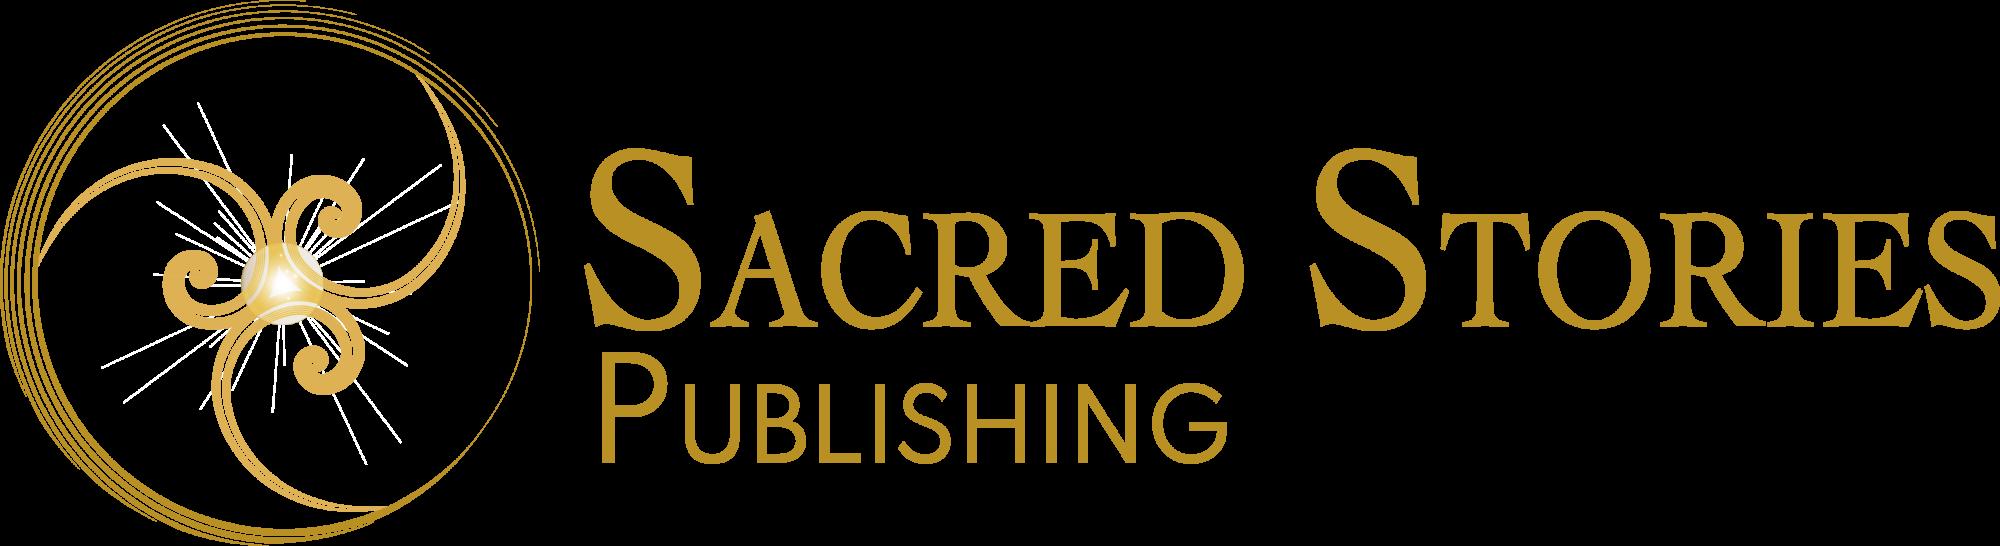 Sacred Stories logo